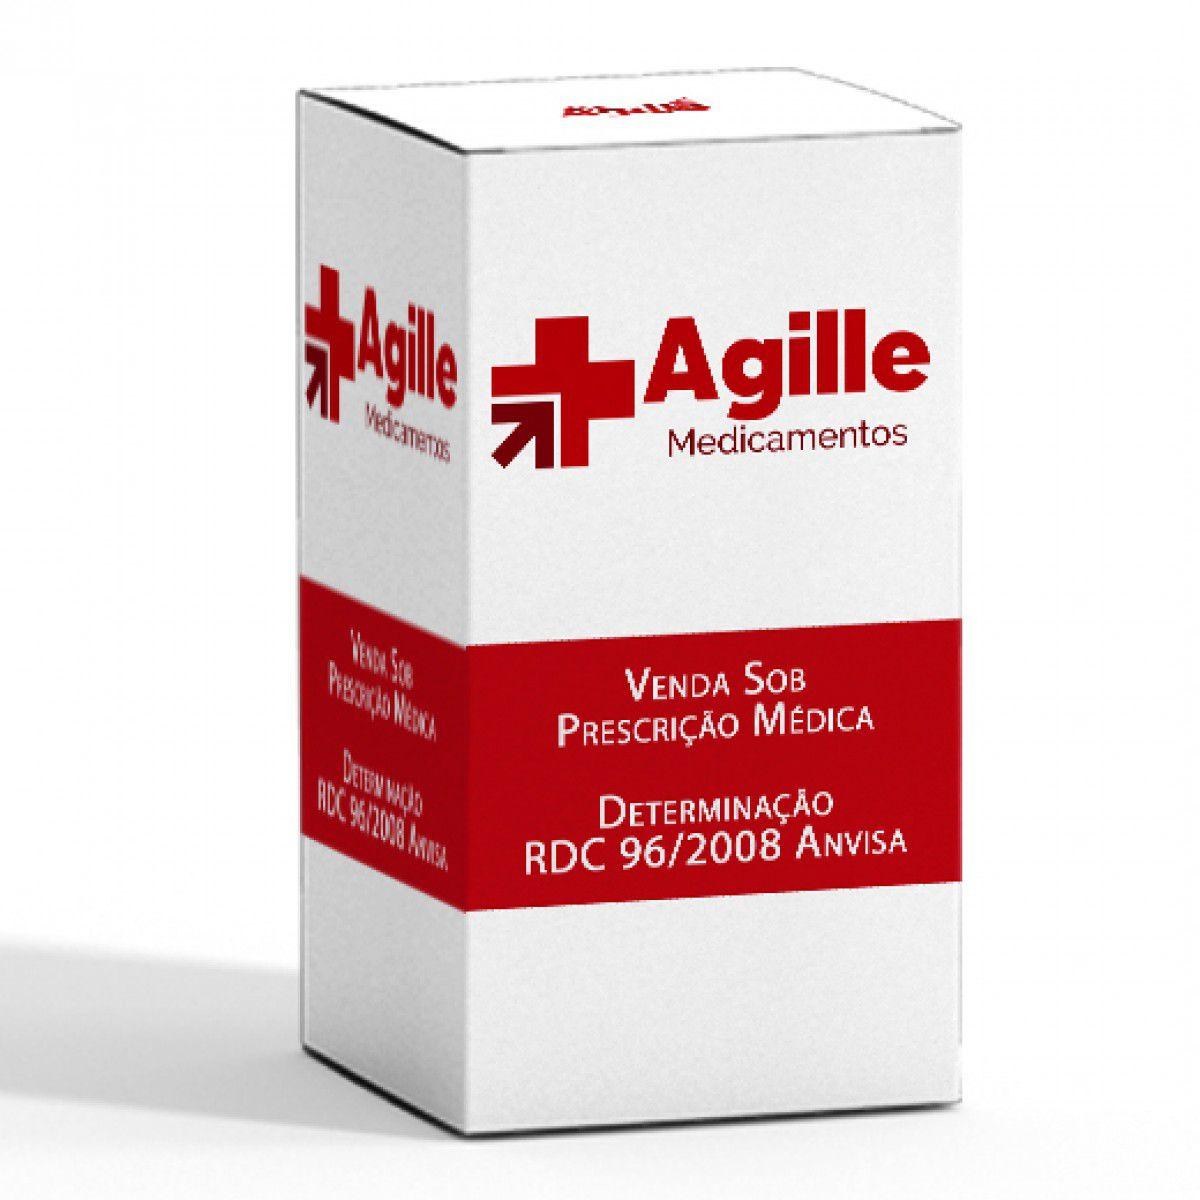 OSTEONIL INJETAVEL 20MG C/1 SERINGA DE 2ML  - Agille Speciality